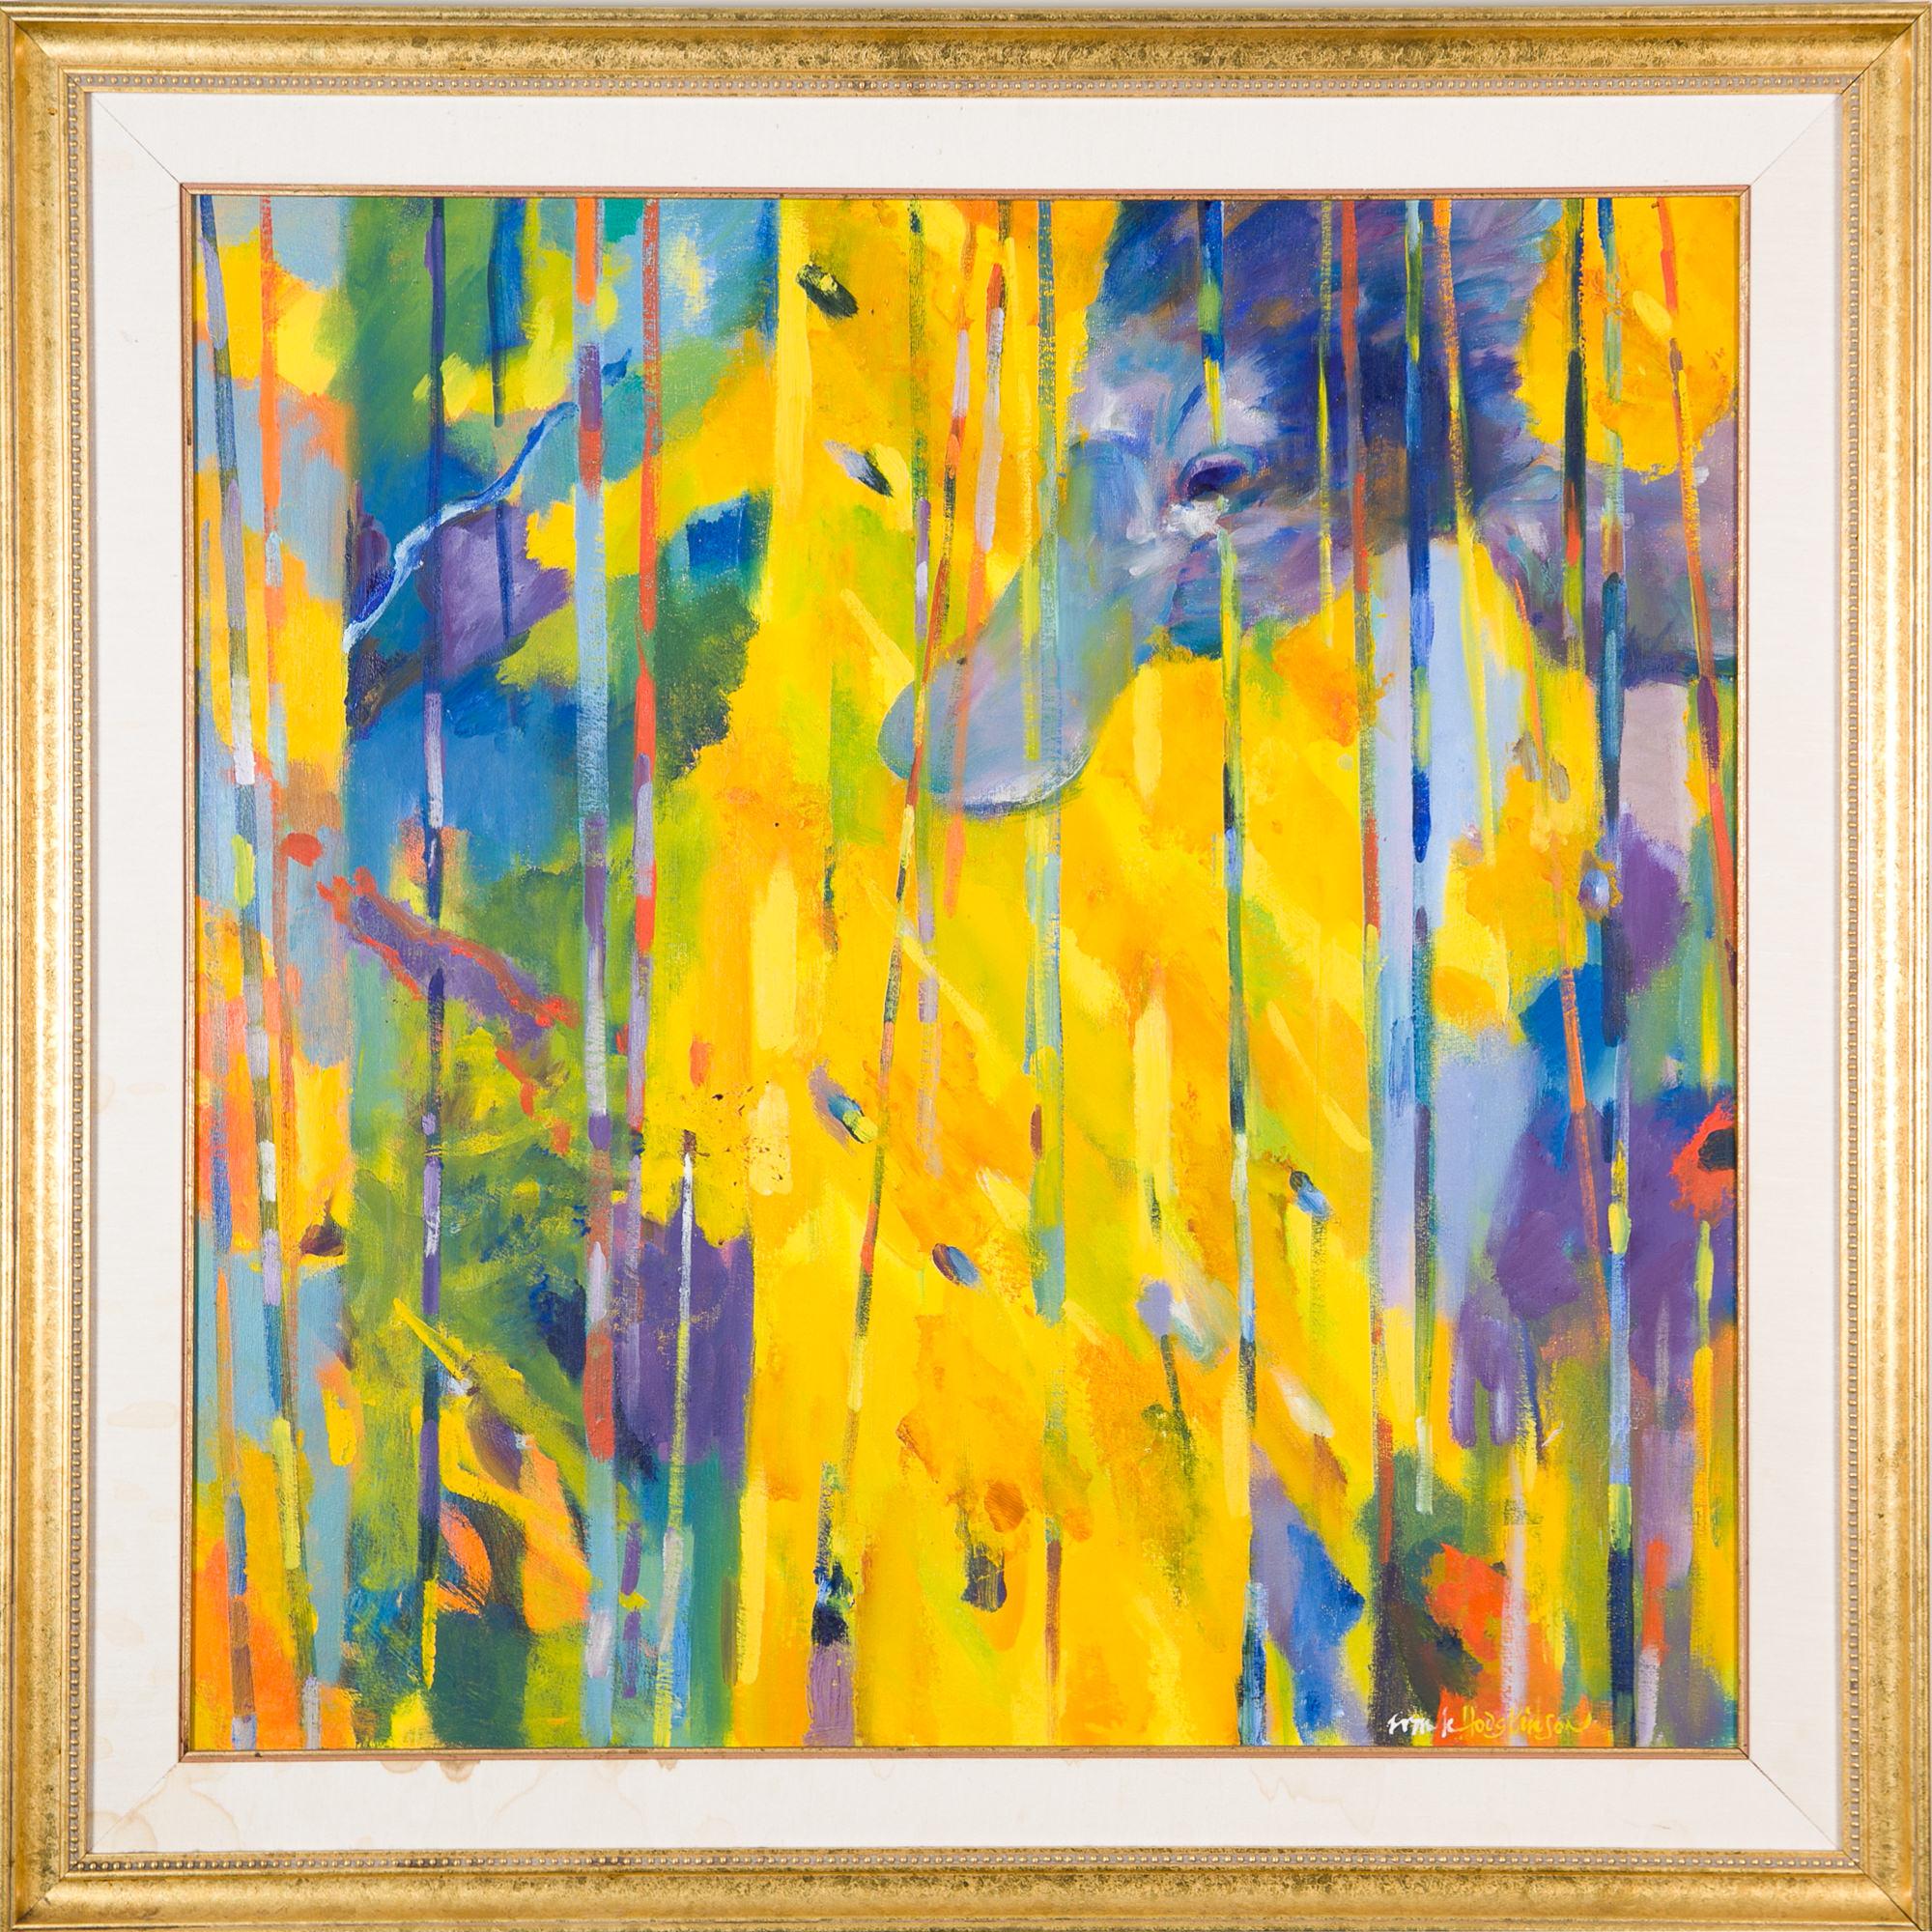 'Frank Hodgkinson (1919-2001) Platypus 1993, Oil on Linen Board'